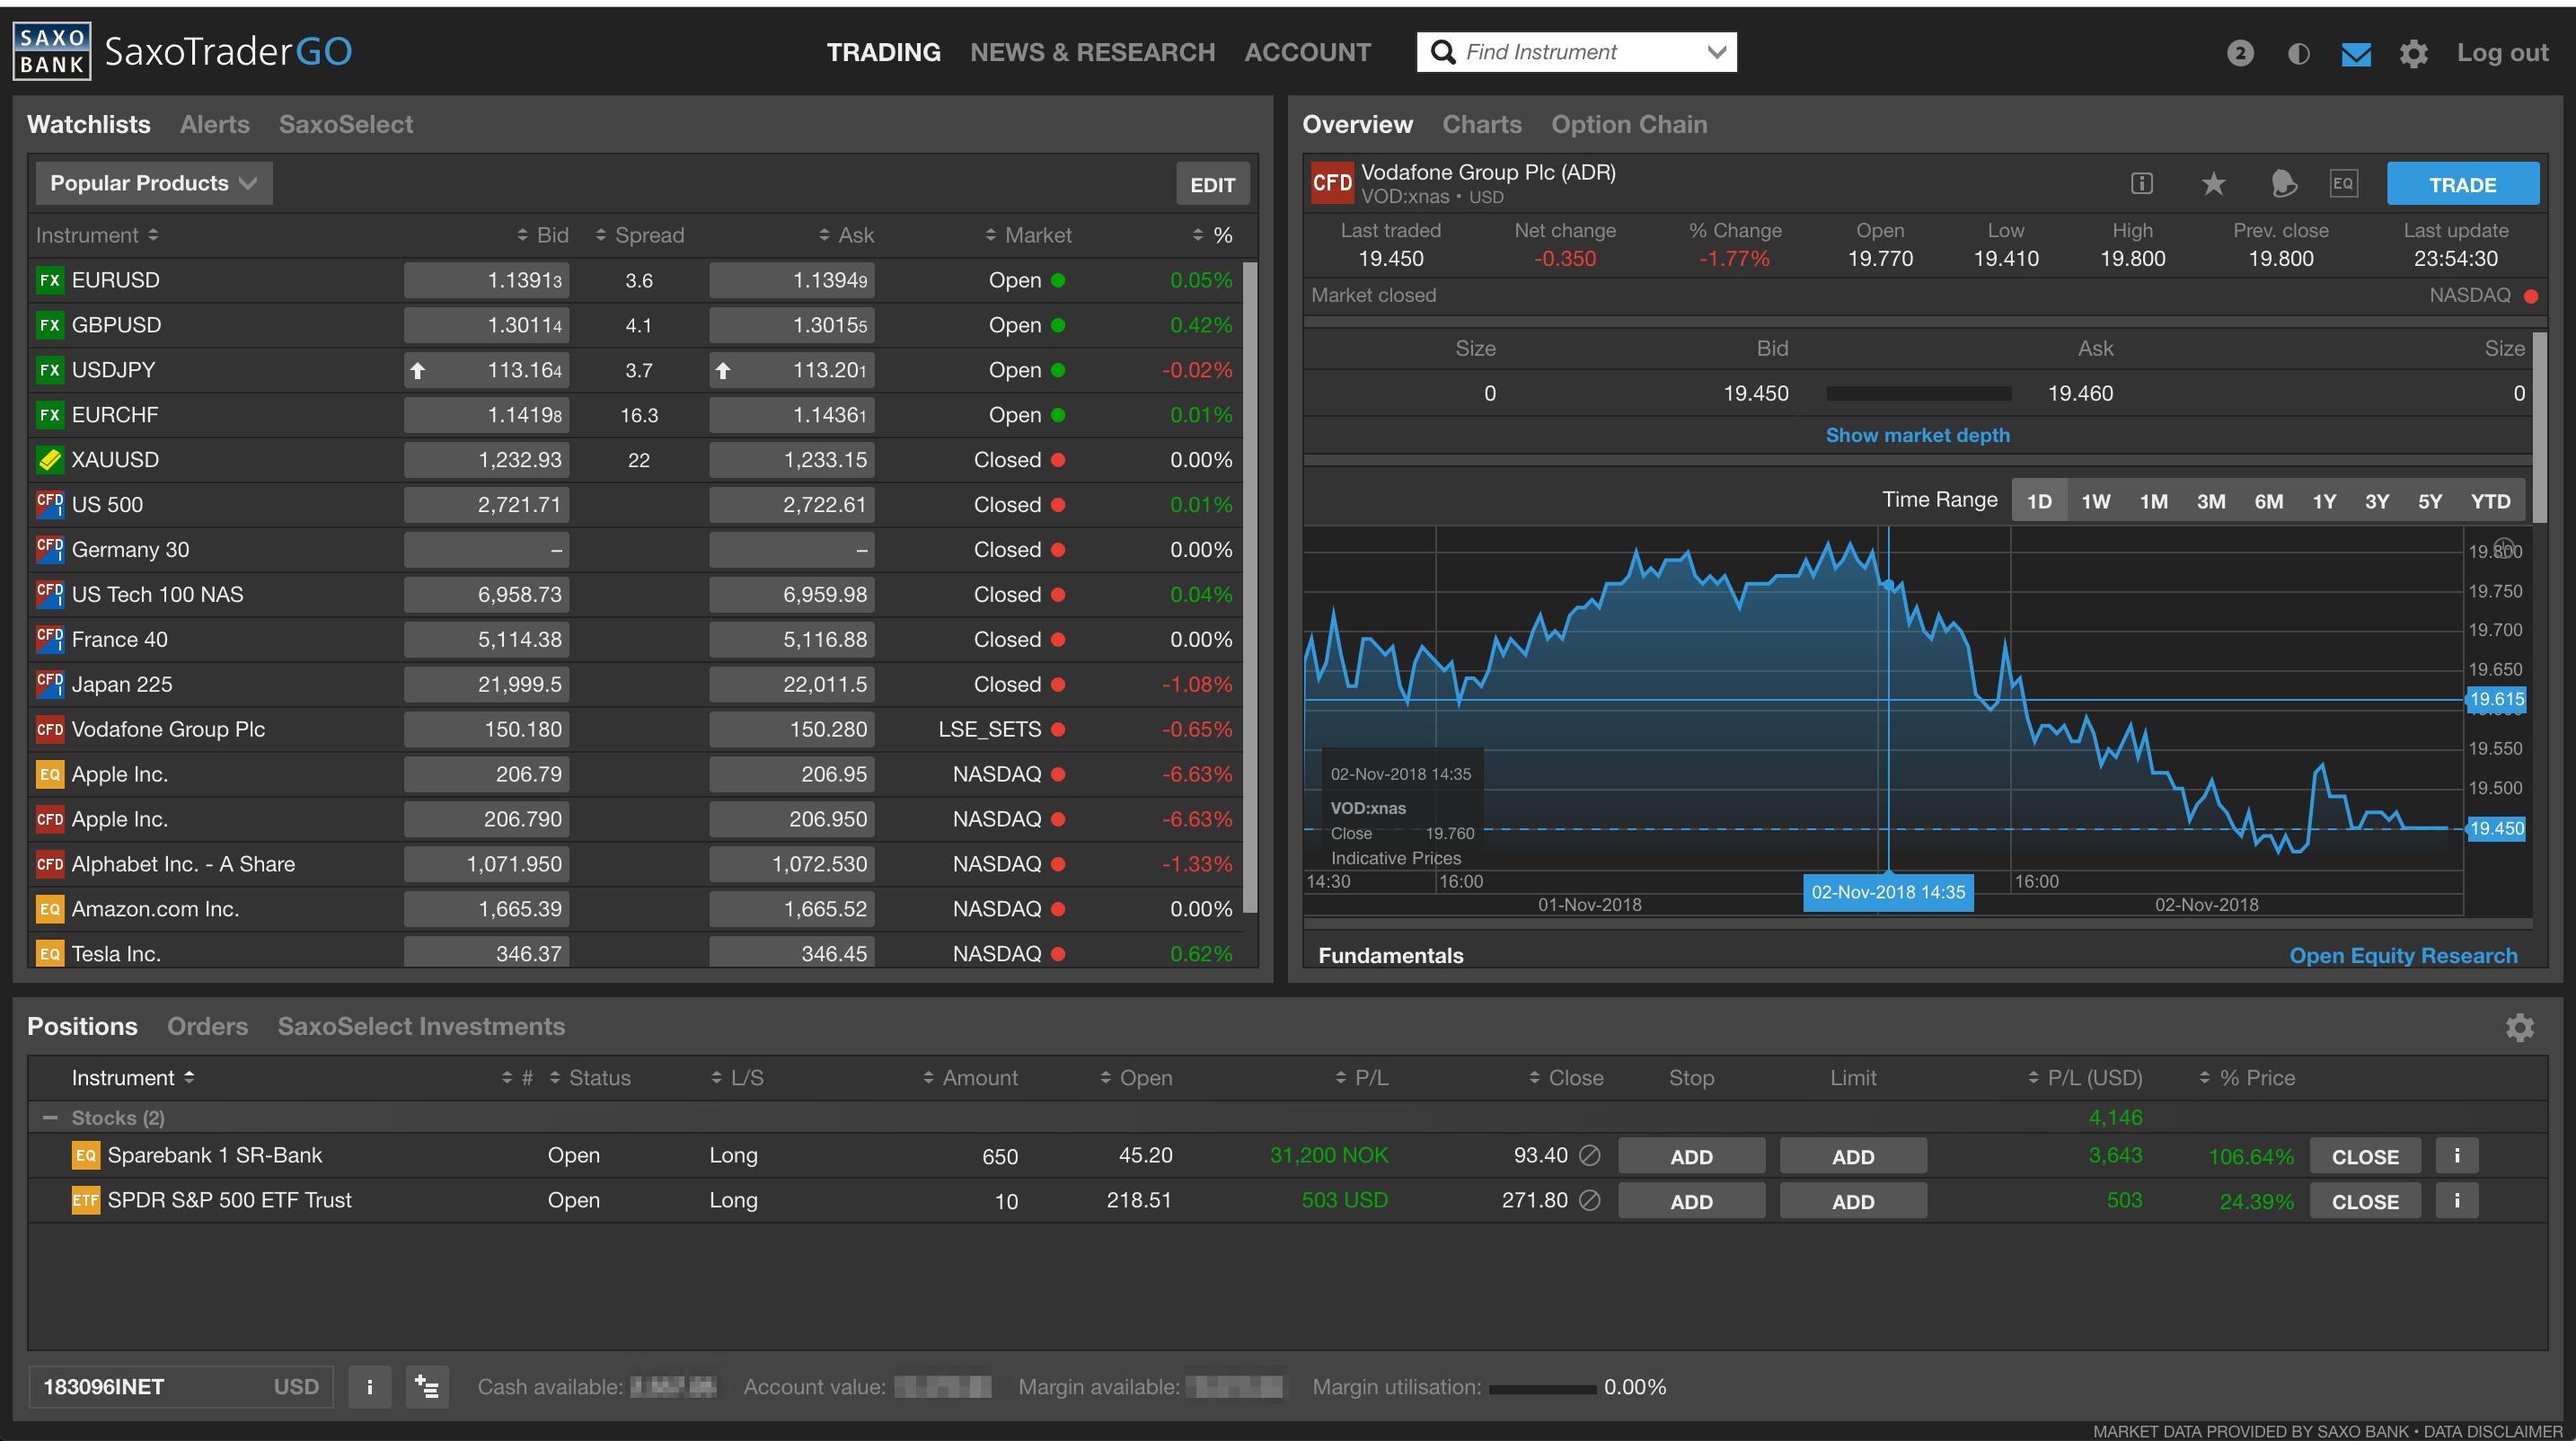 How to buy bitcoin - Saxo Bank - Web trading platform